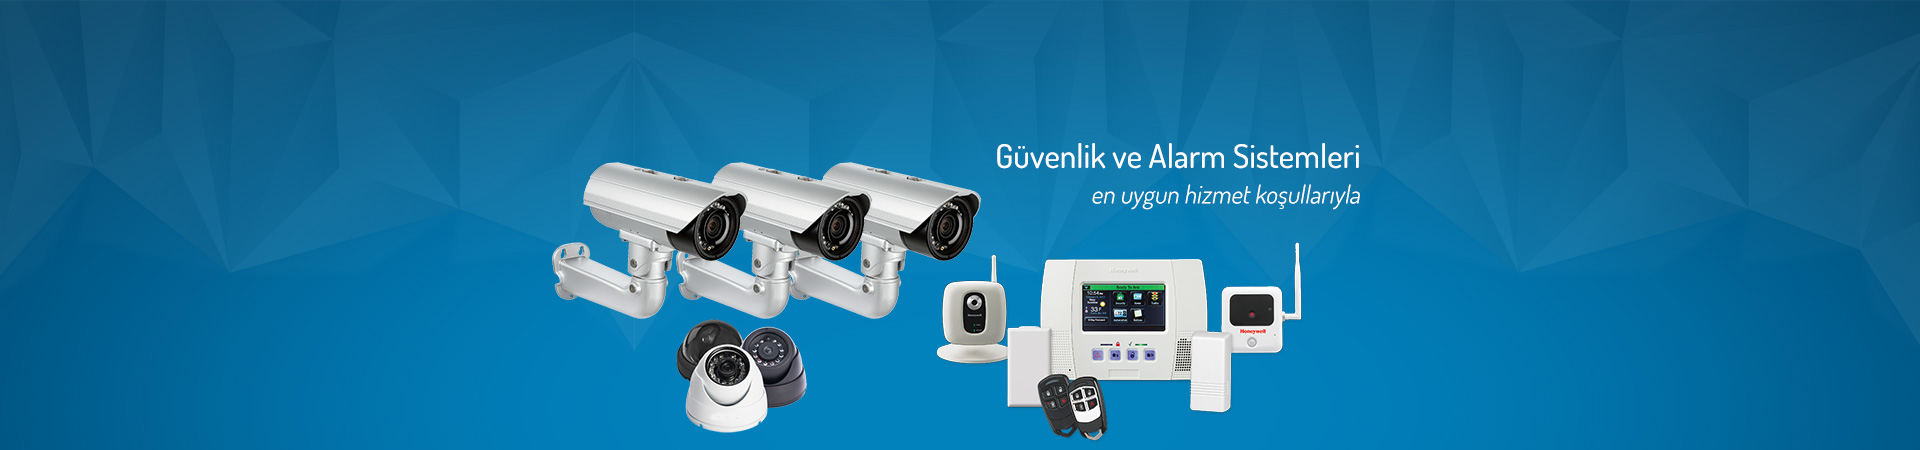 guvenlik-kamera-sistemleri